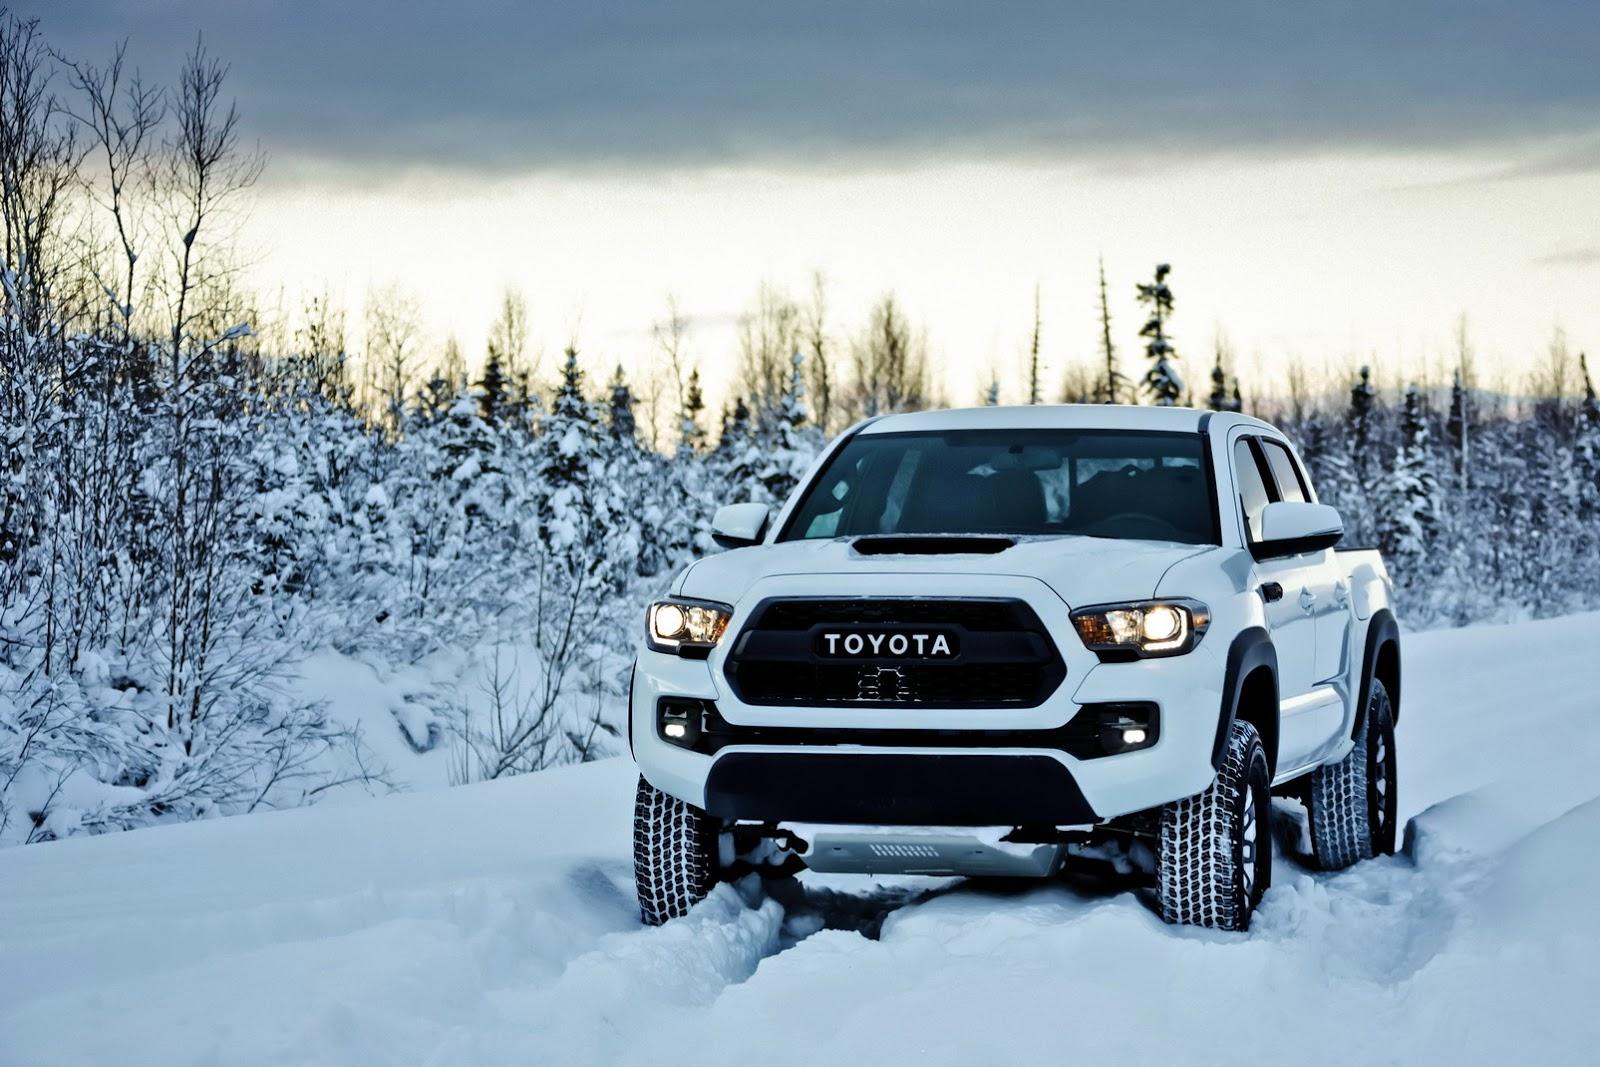 2017 Tacoma Trd Sport Price >> 2017 Toyota Tacoma TRD Pro Starts At $40,760, It's Adventure-Ready - autoevolution